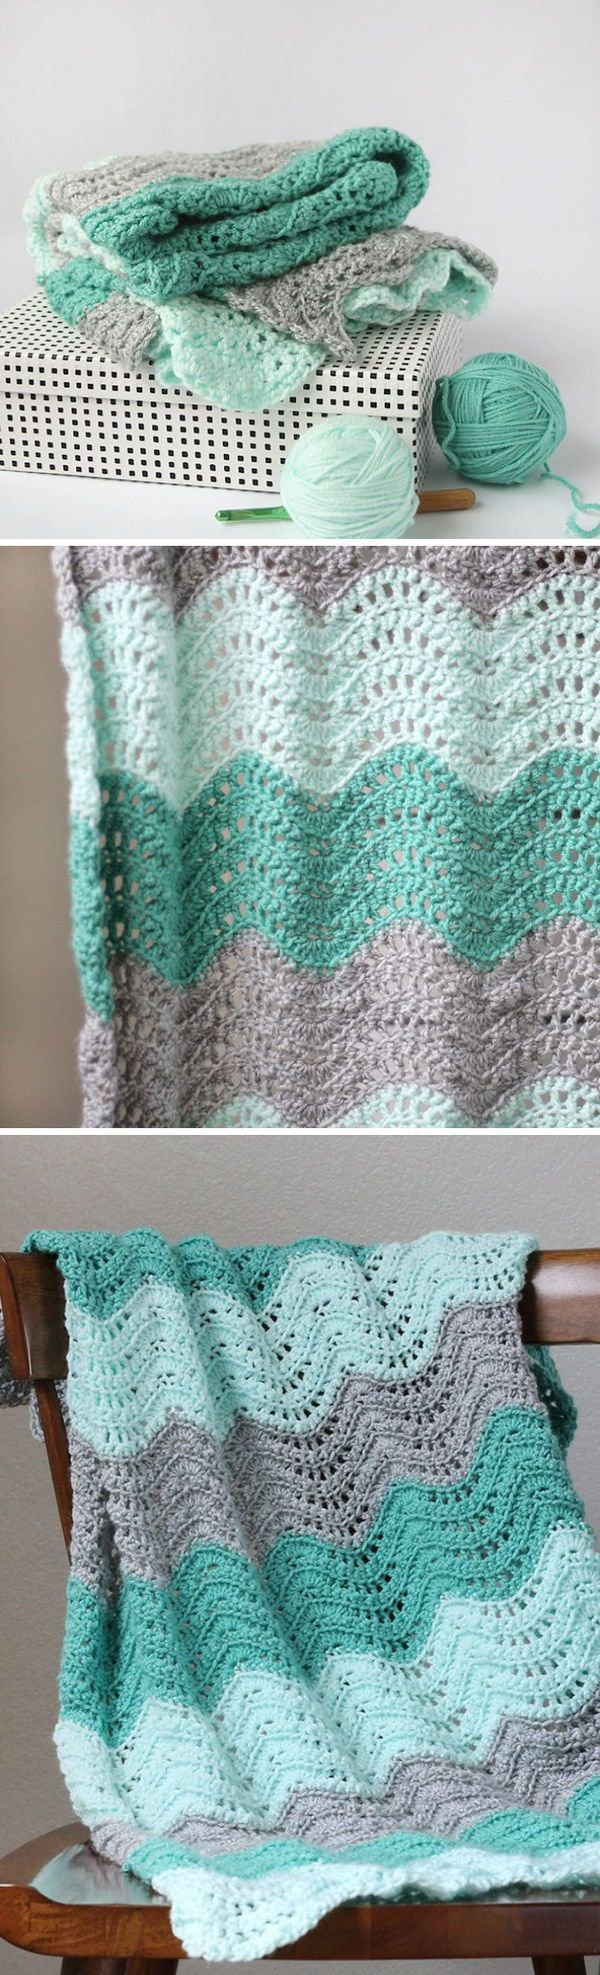 23 Free Crochet Blanket Patterns with Lots of Tutorials | Crochet ...